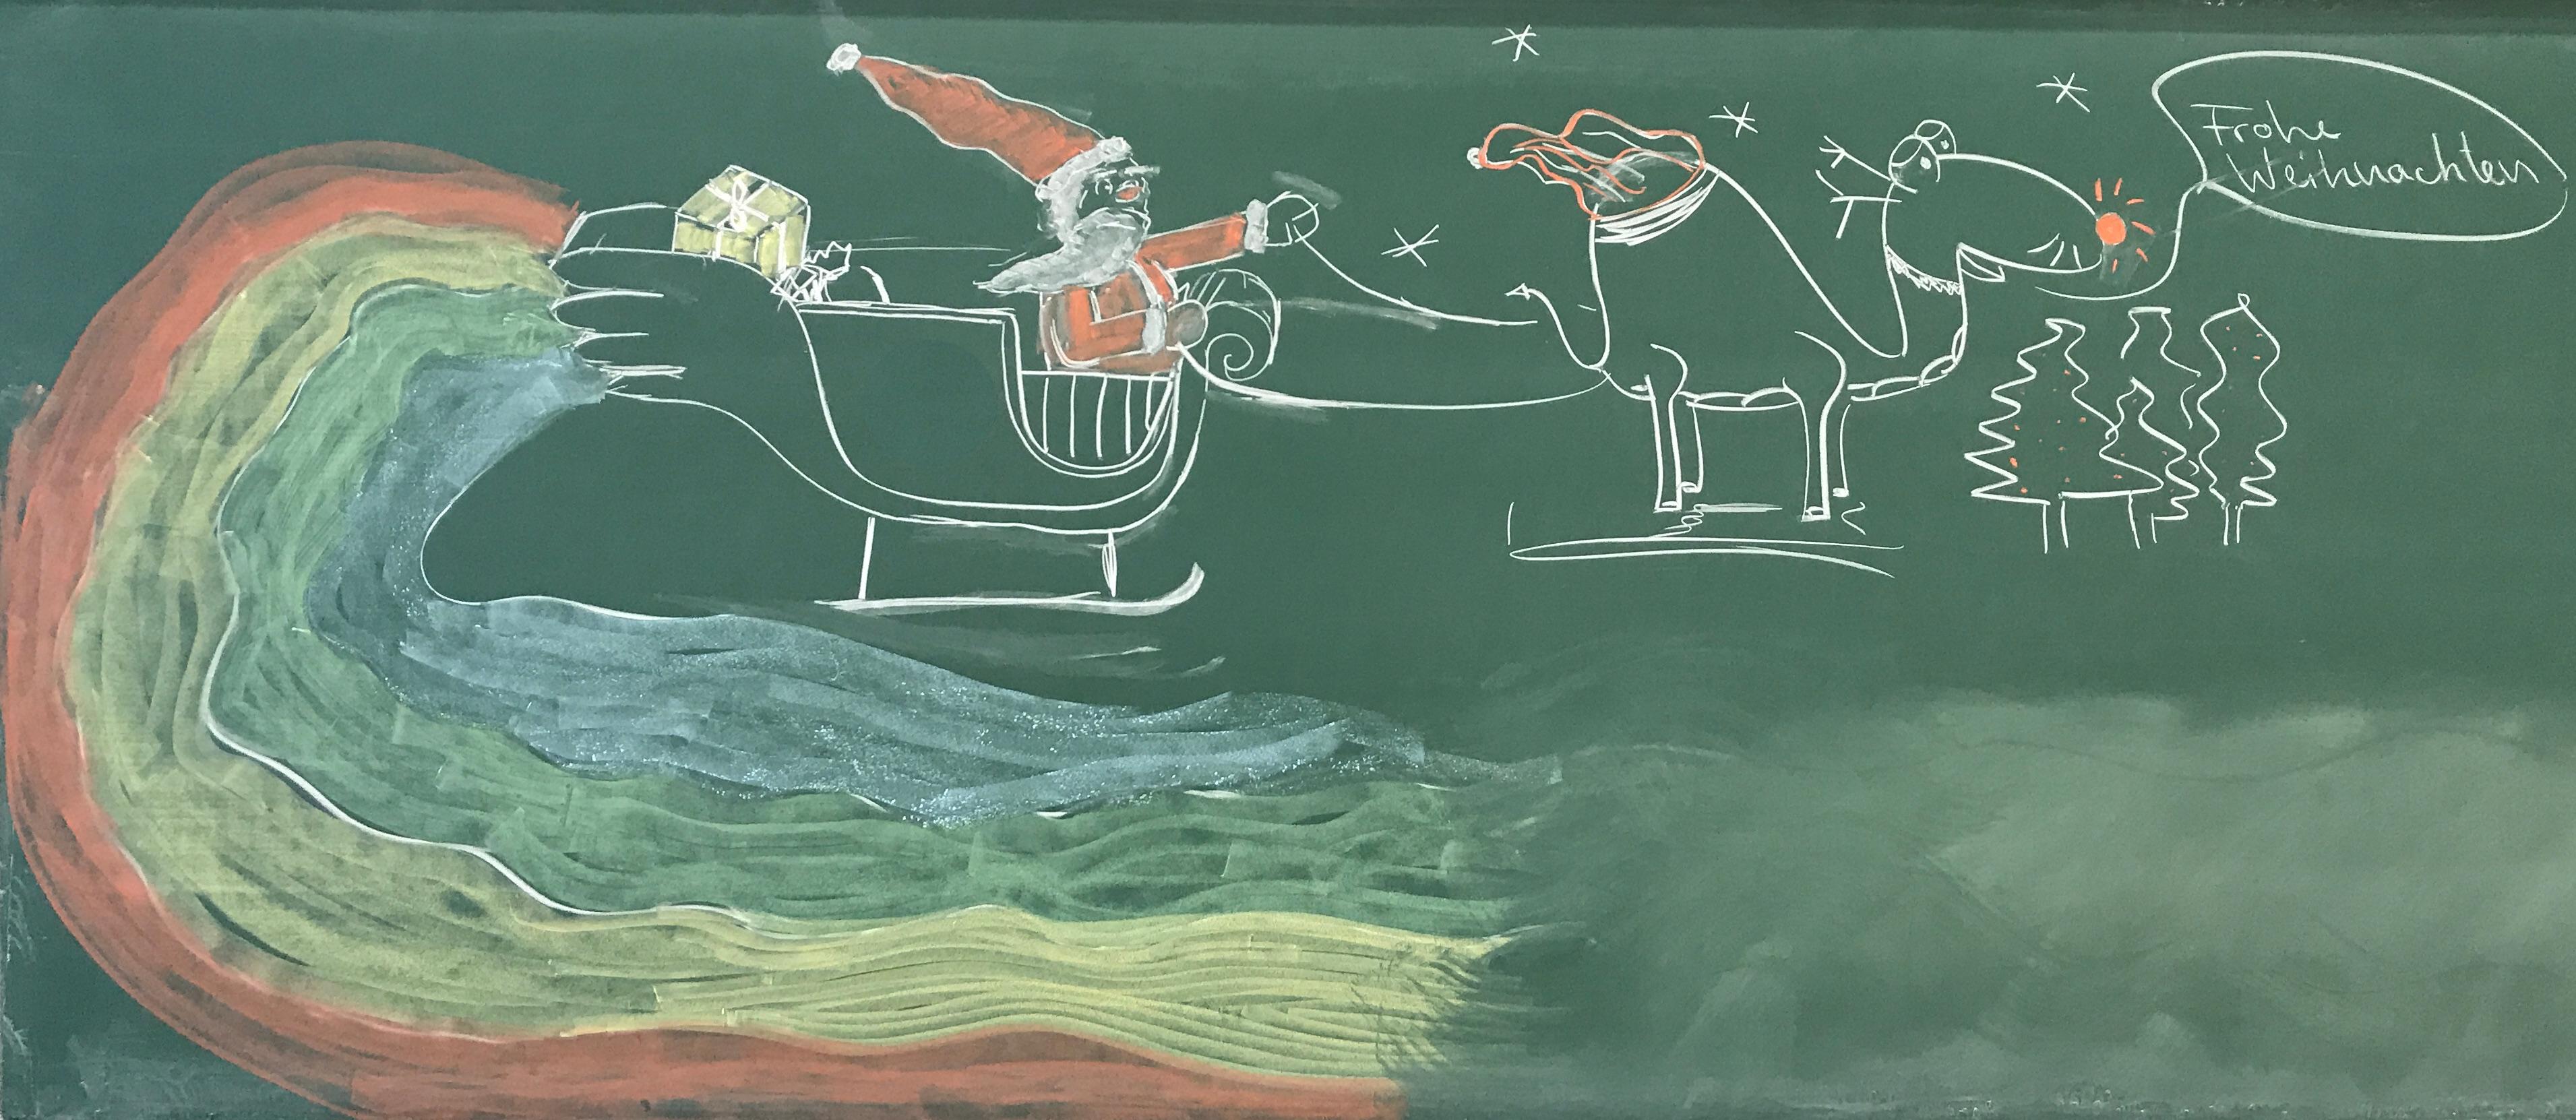 "Blackboard Arts ""Frohe Weihnachten"""